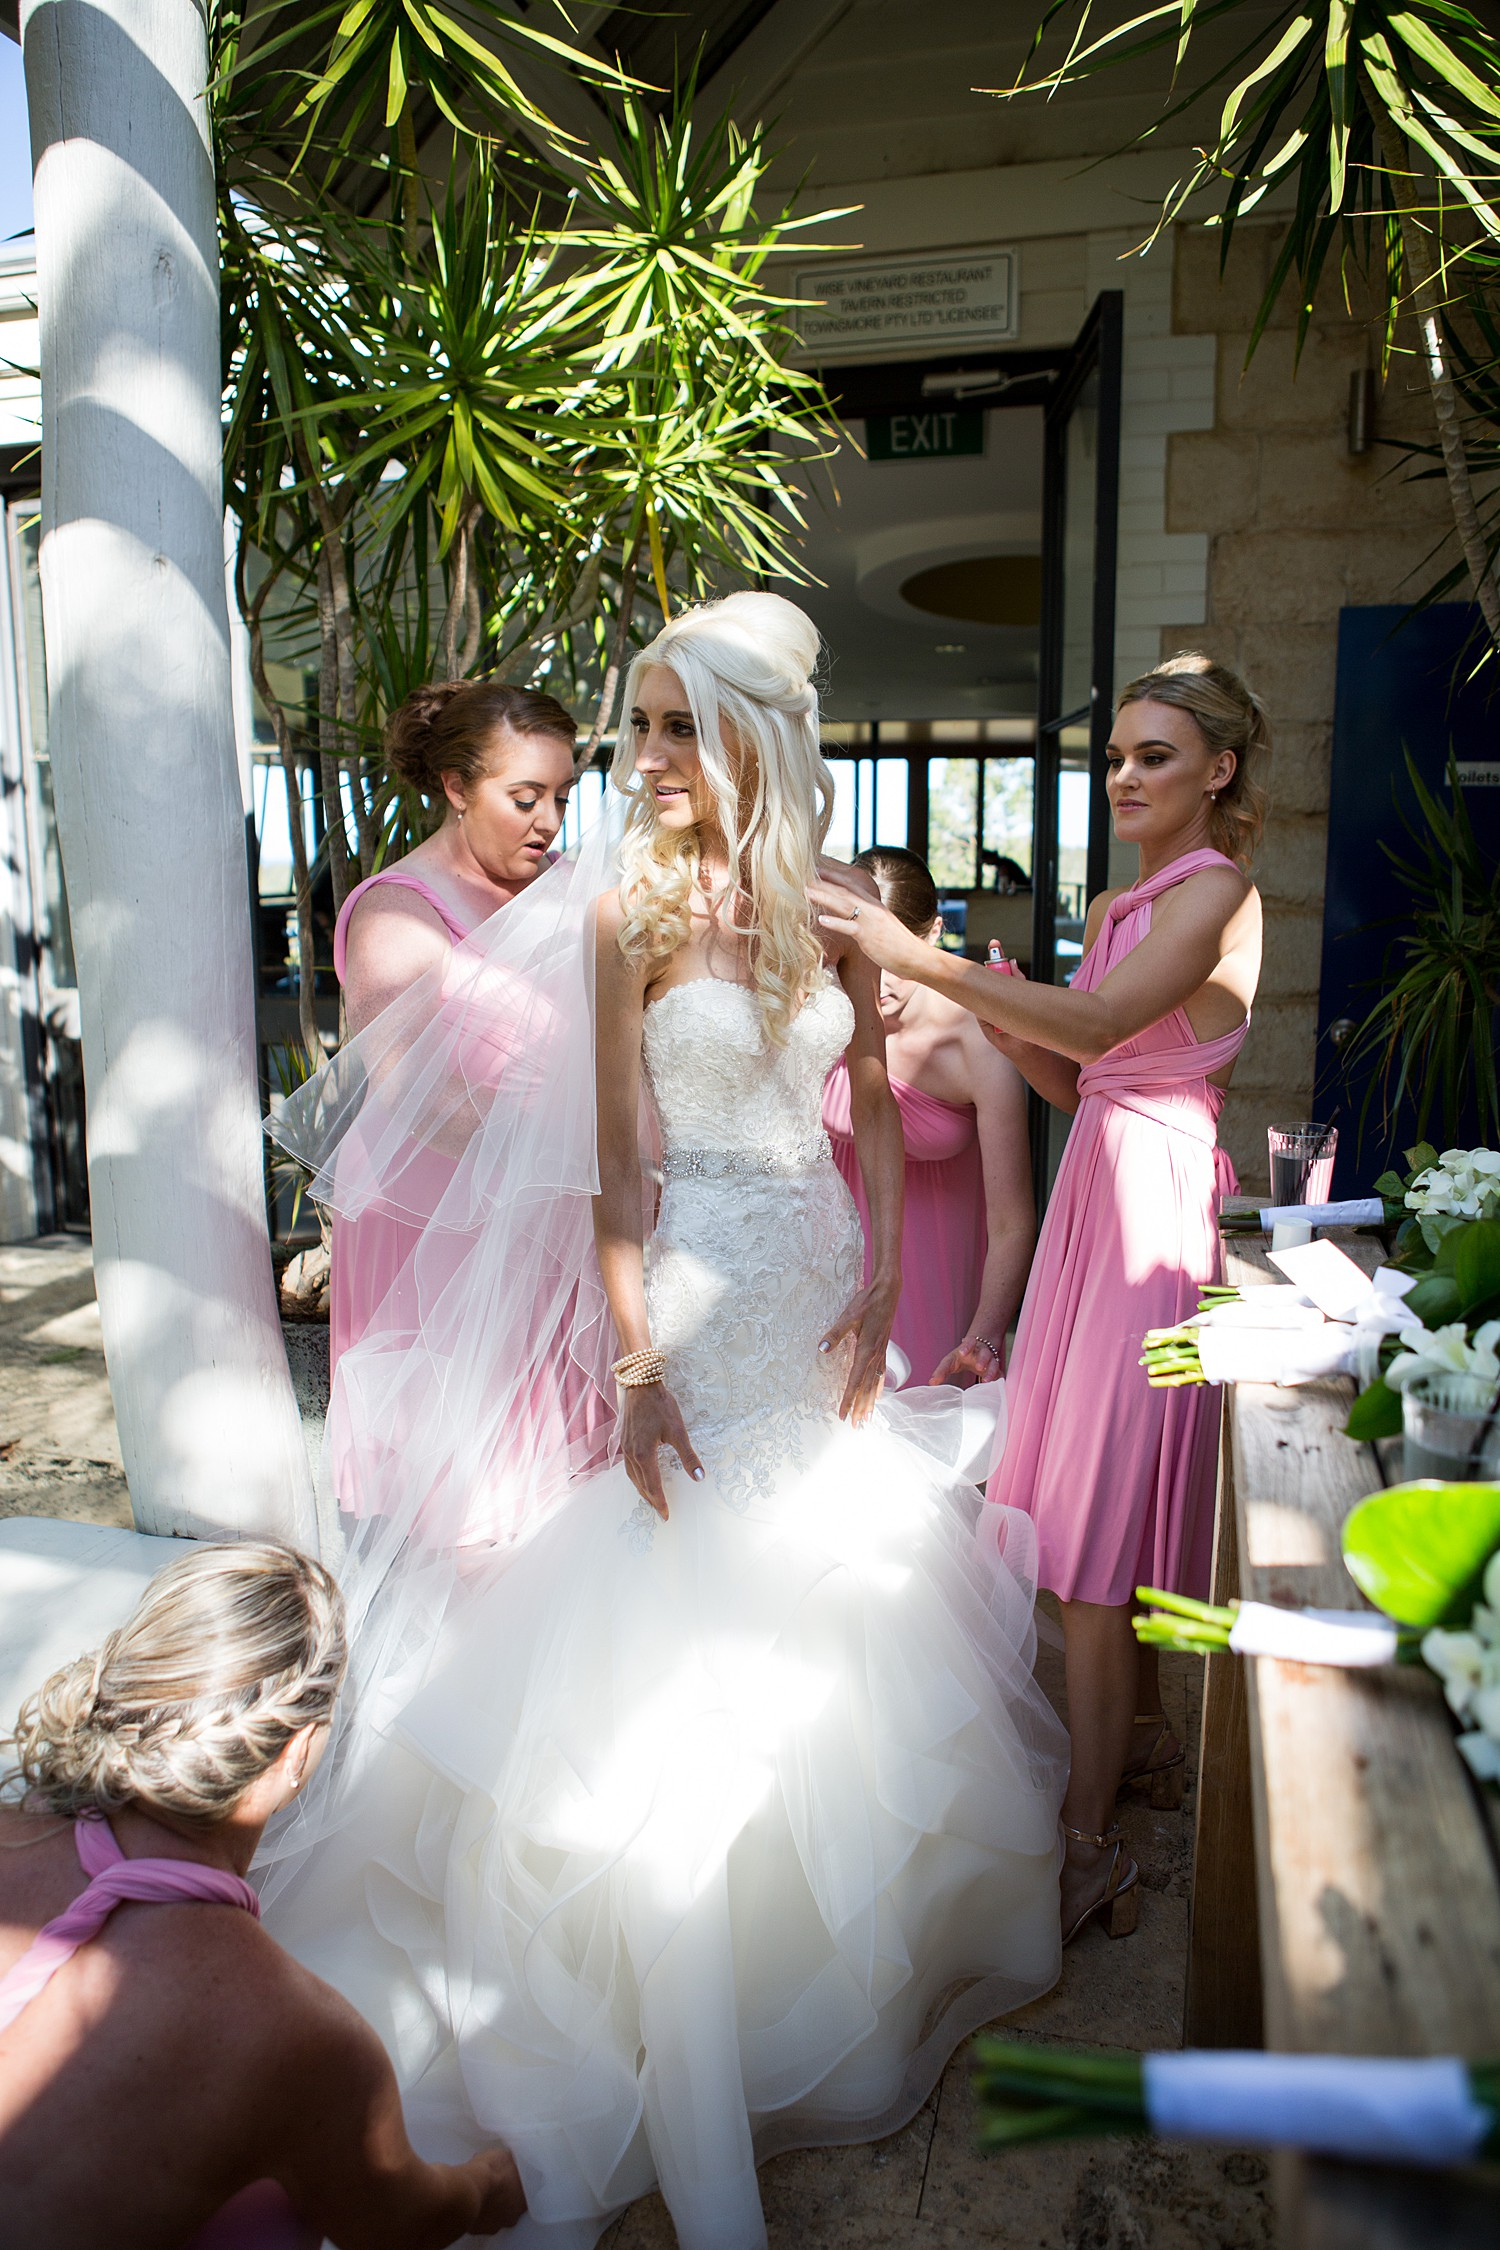 wise_wines_southwest_WA_wedding_0029.jpg